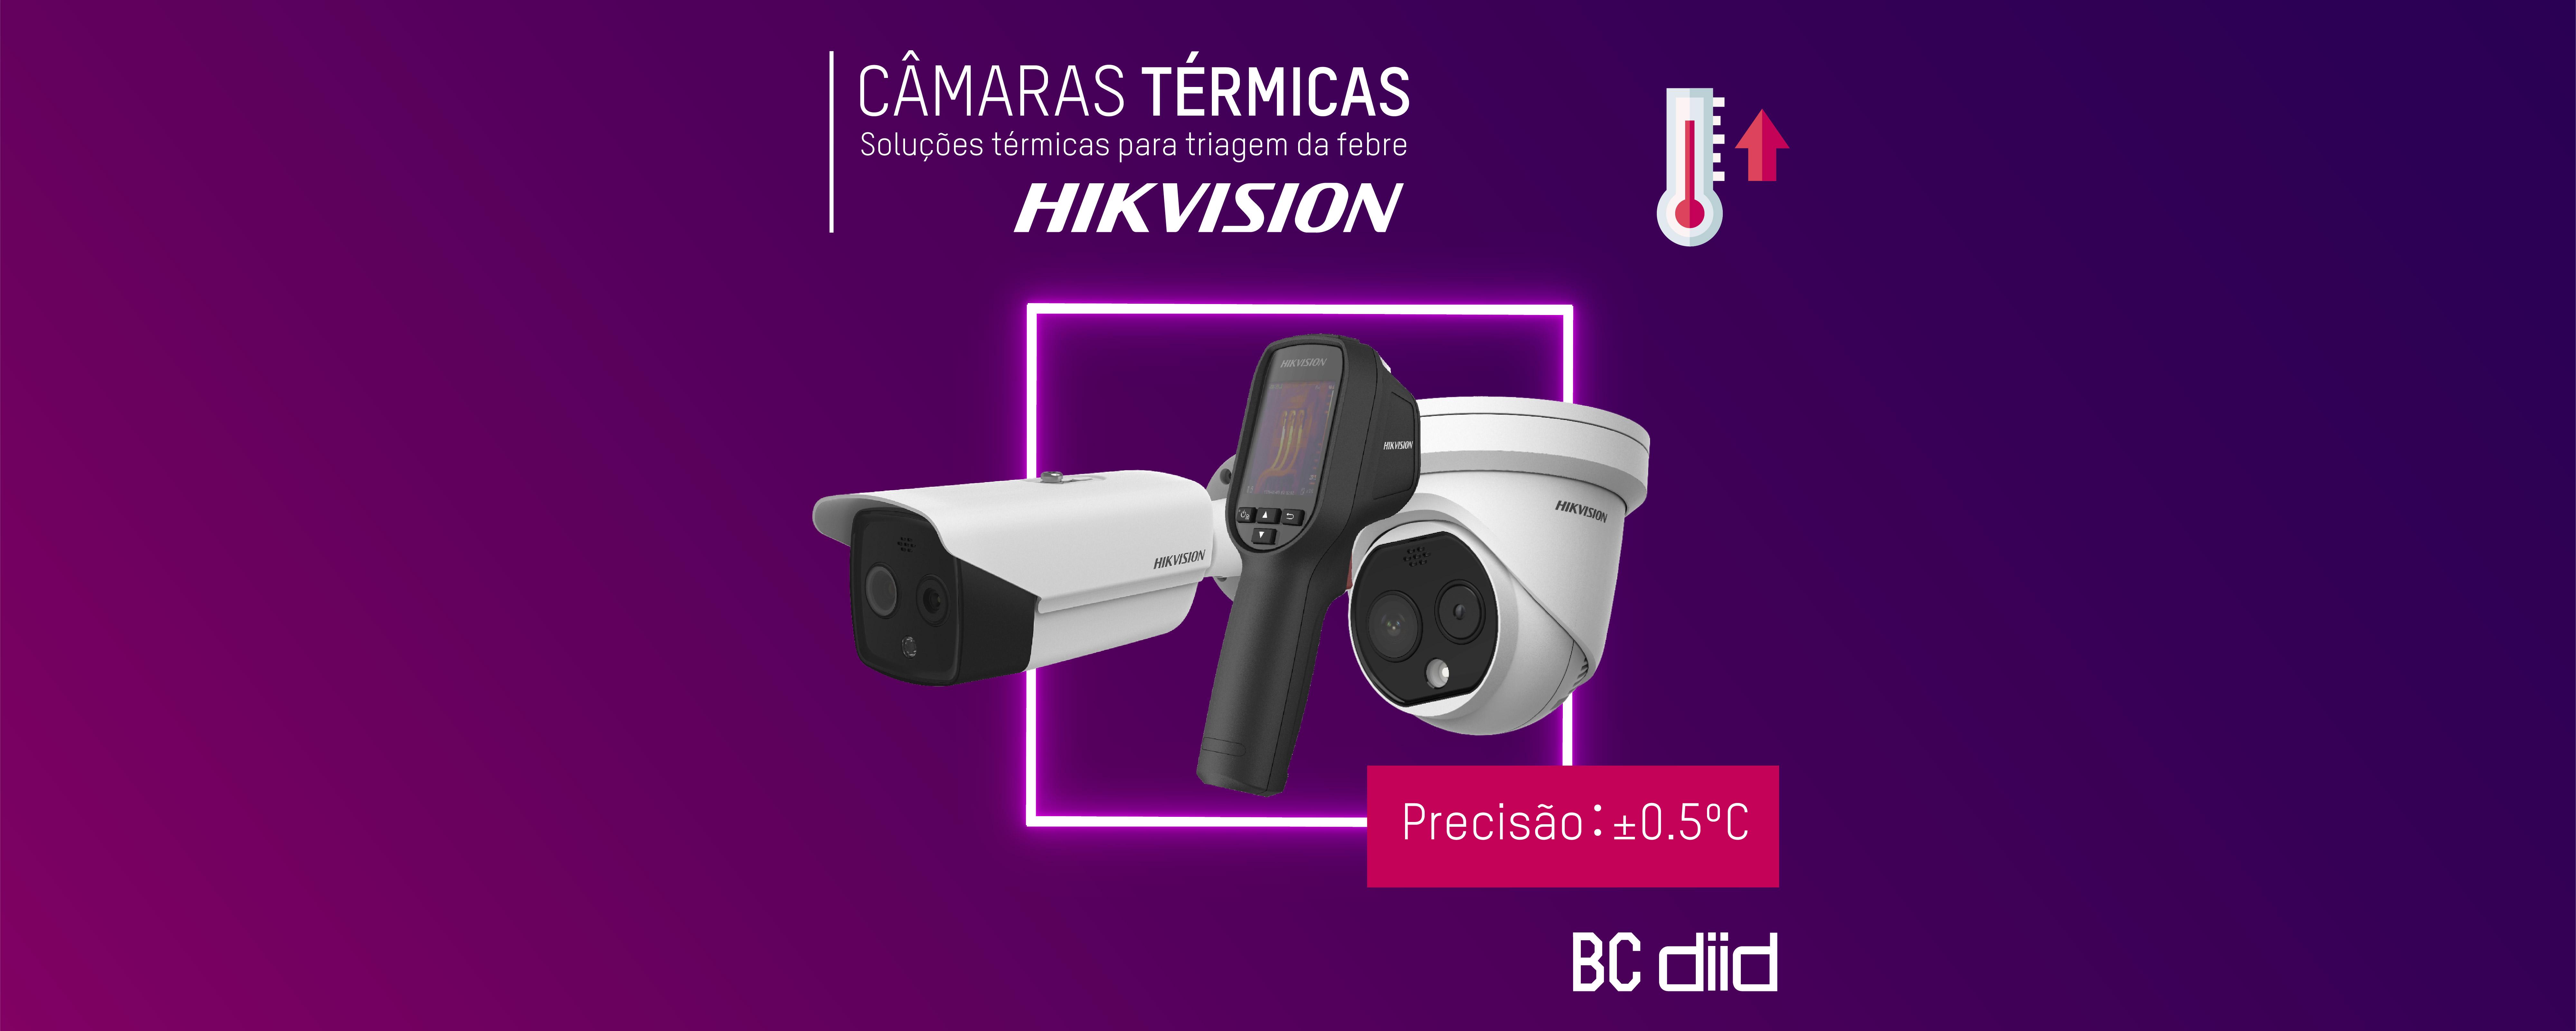 Câmaras Térmicas Hikvision